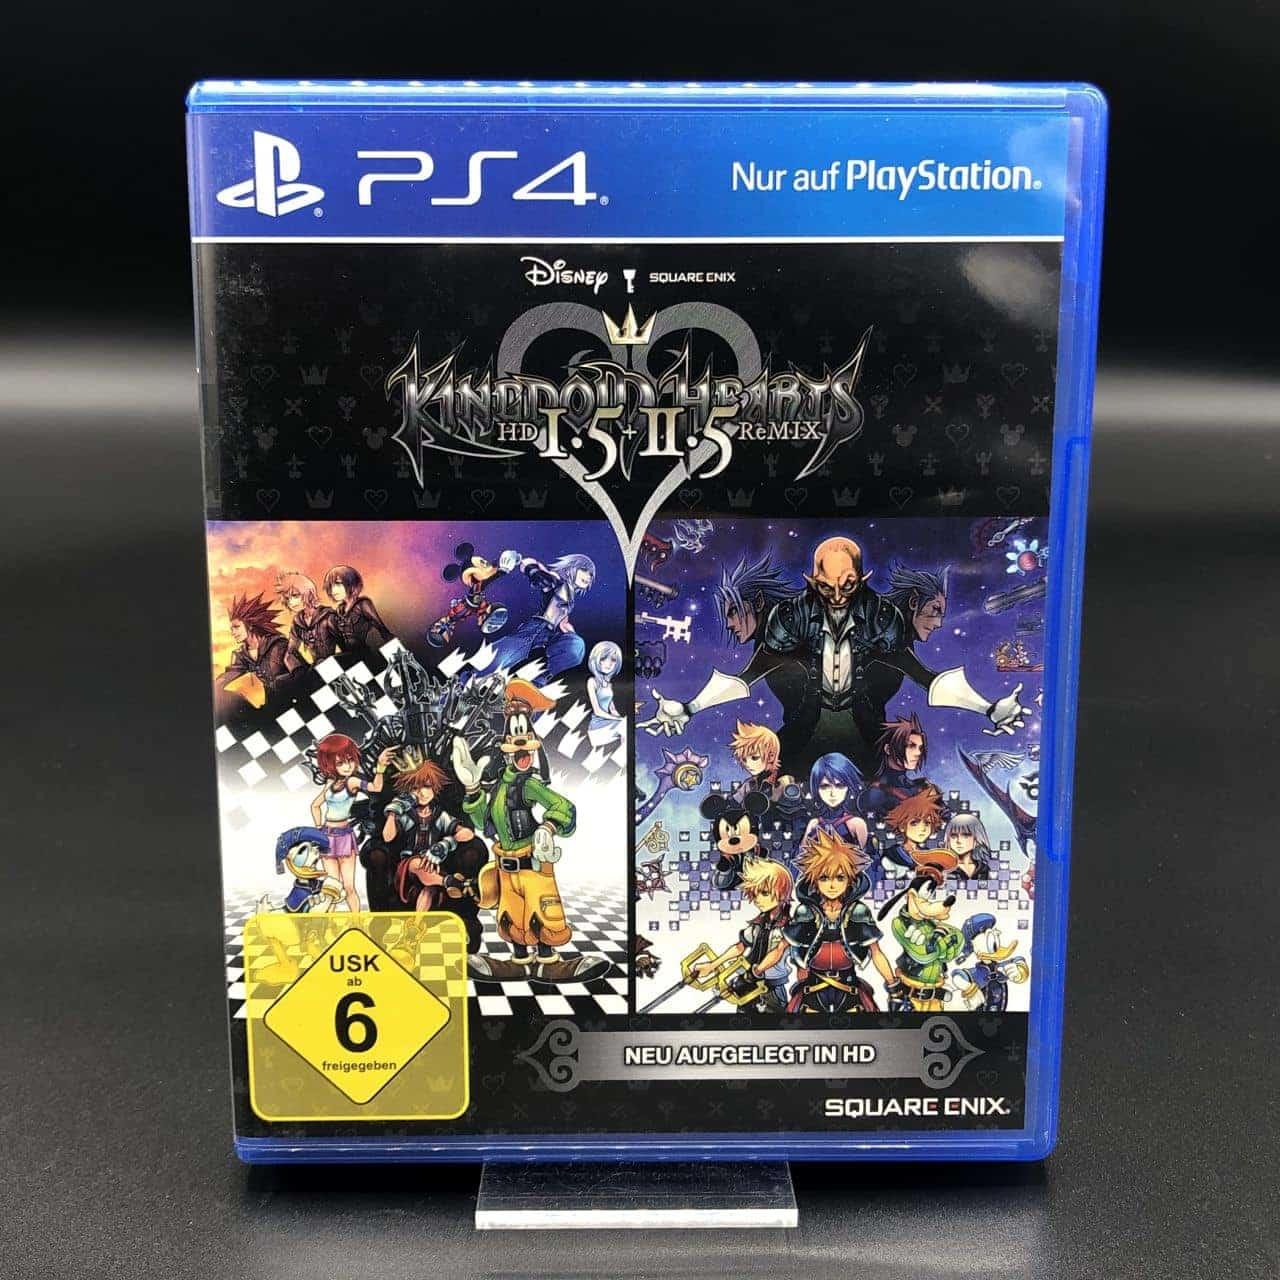 PS4 Kingdom Hearts 1.5 + 2.5 Remix (Sehr gut) Sony PlayStation 4